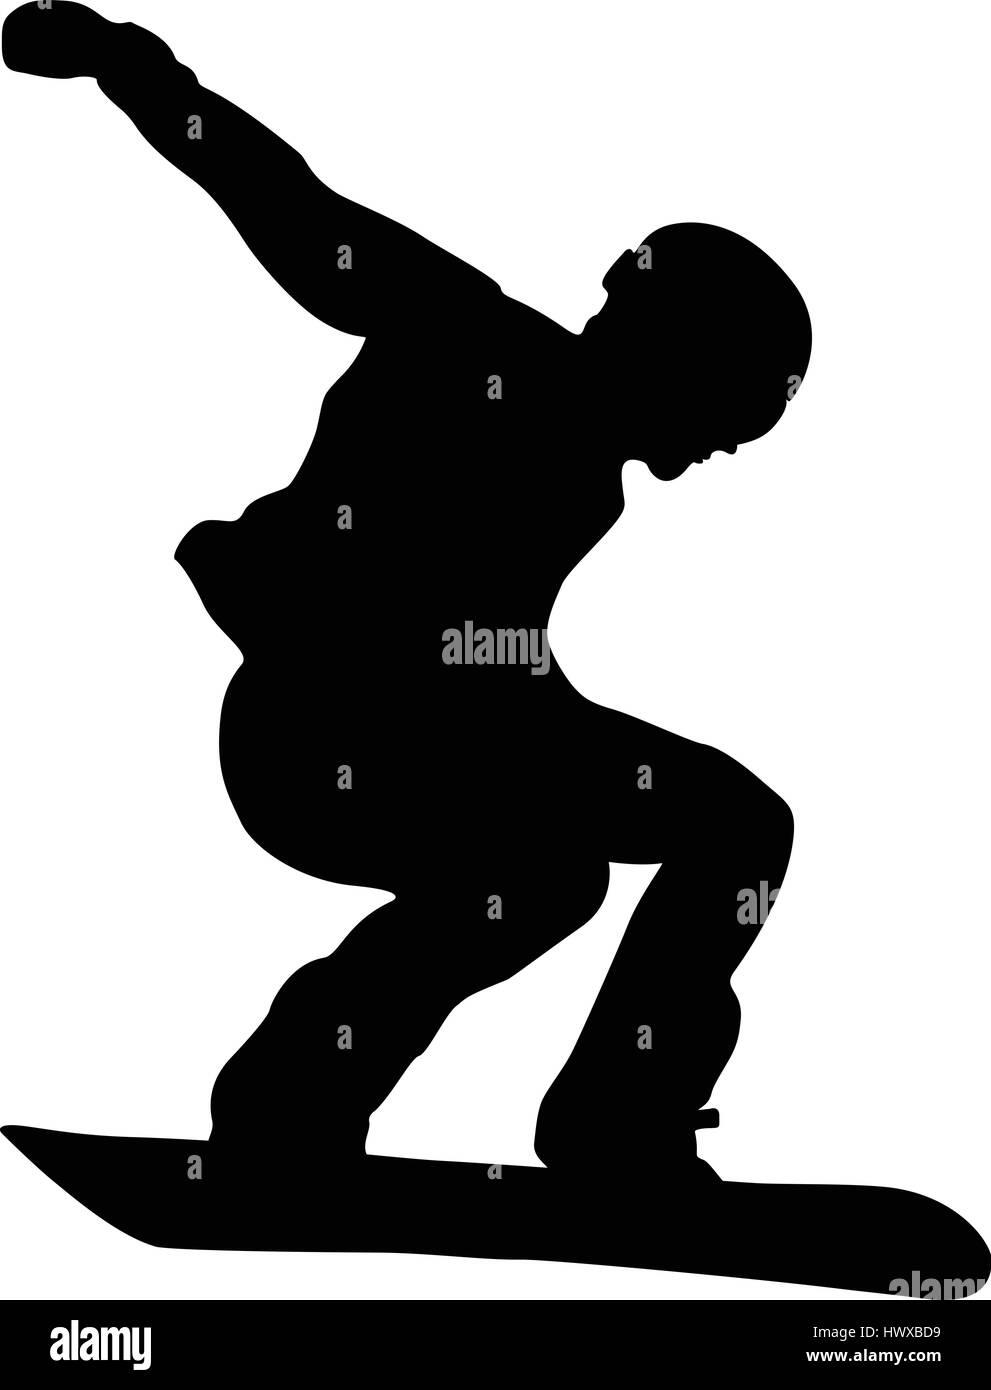 male athlete snowboarder jump black silhouette - Stock Image